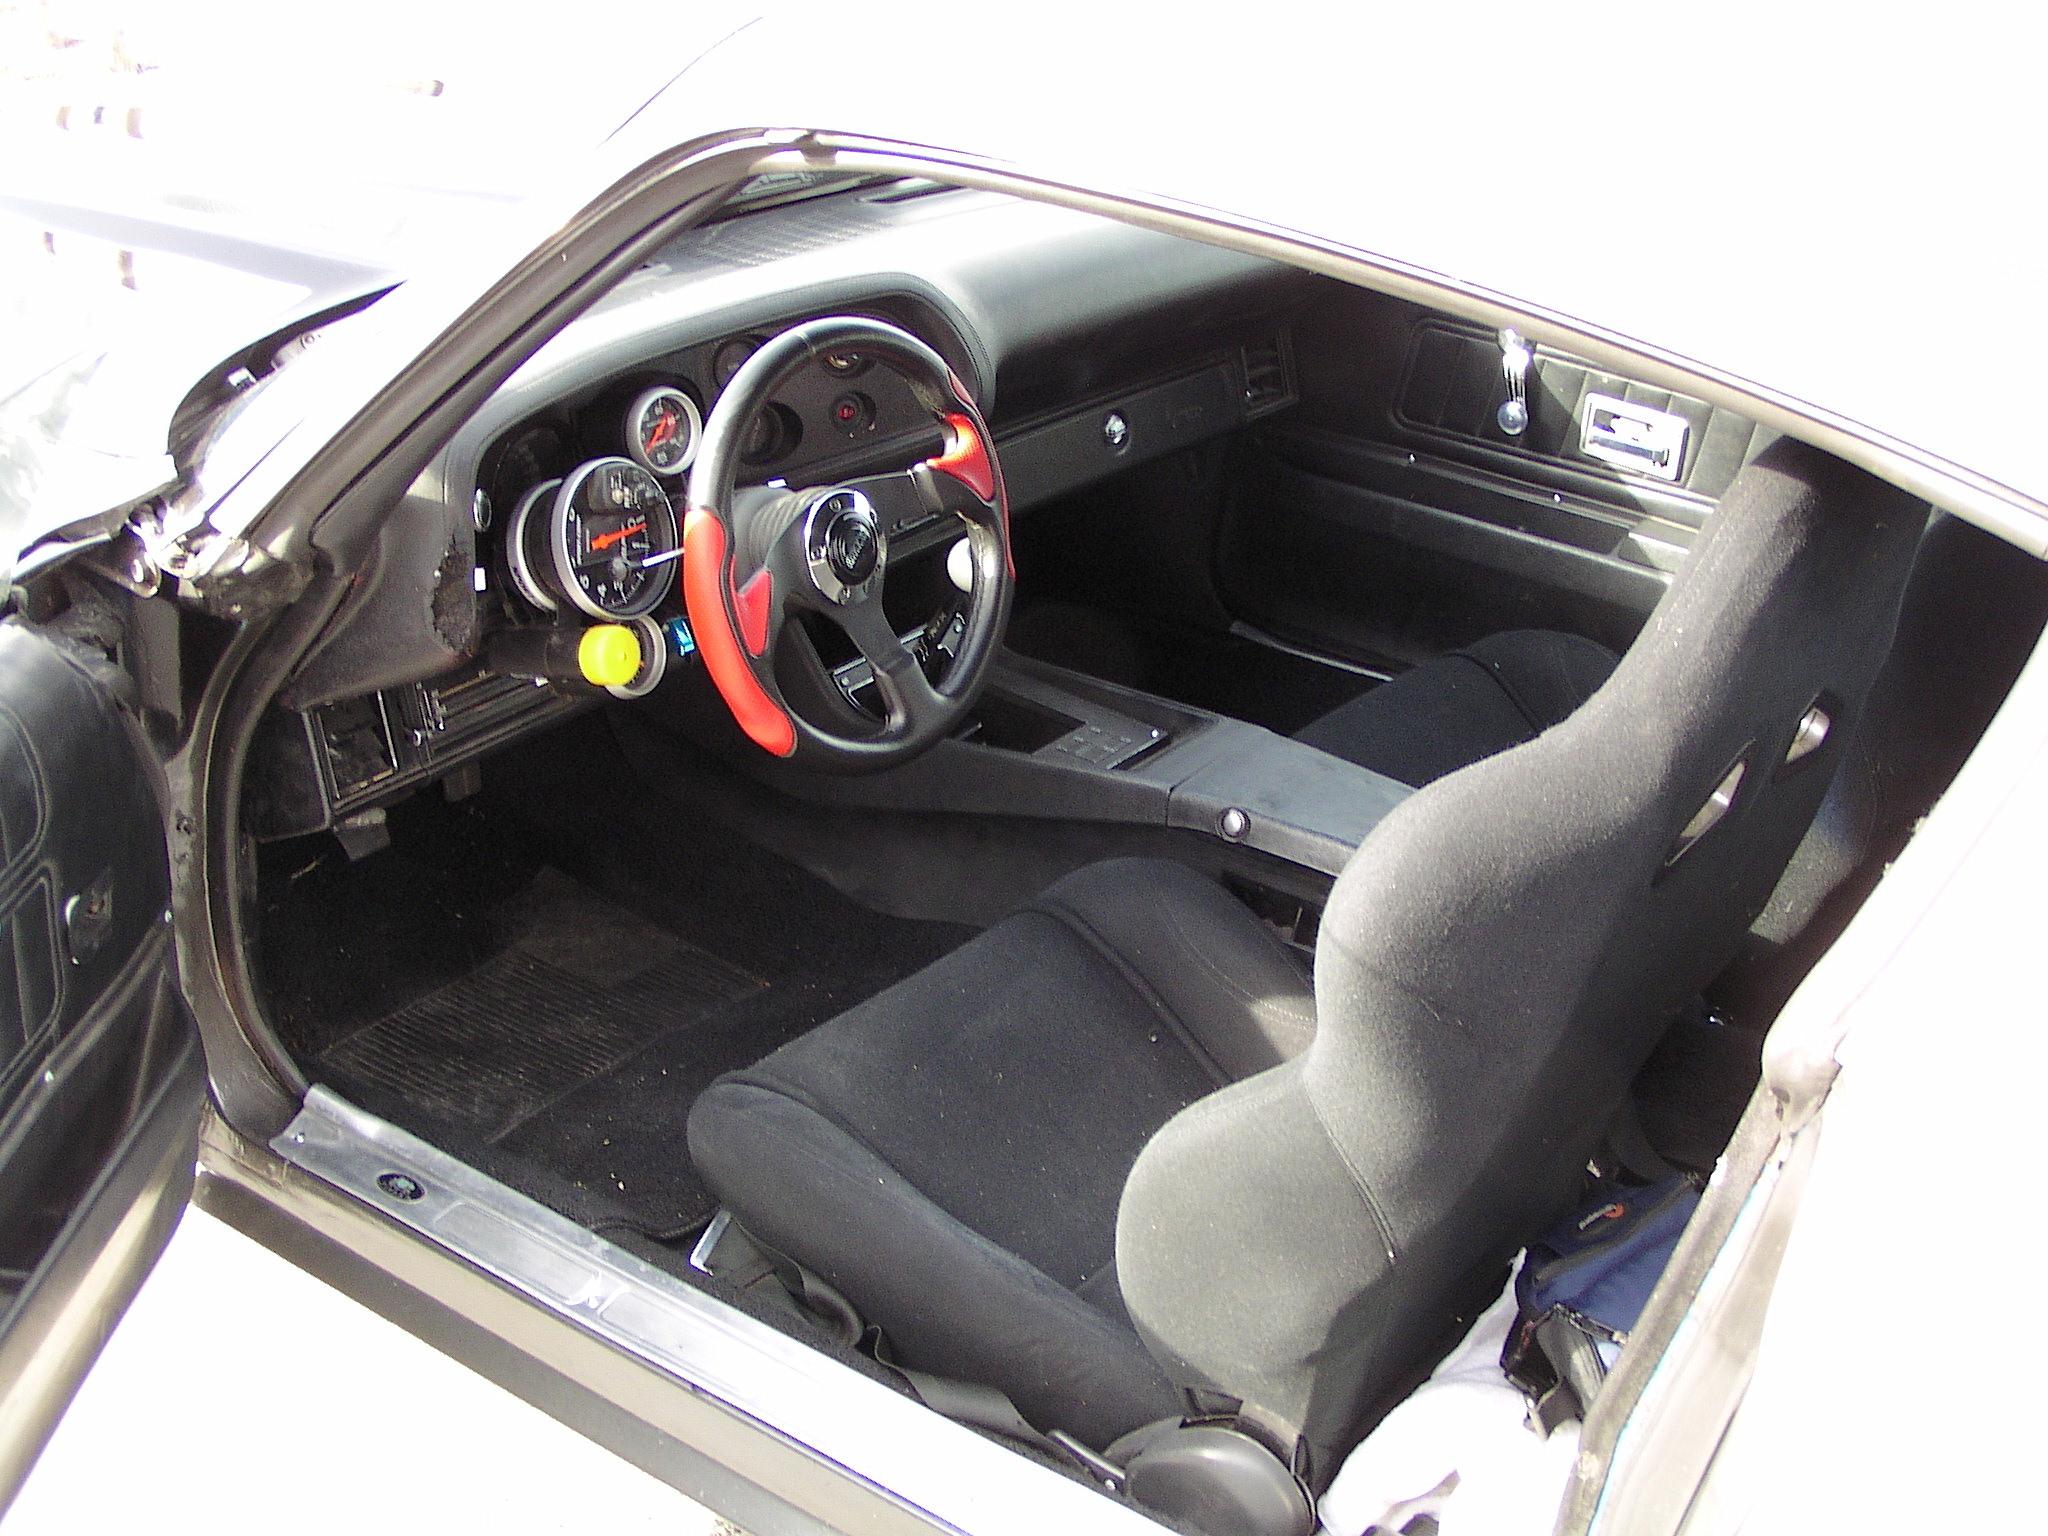 1970 Chevrolet Camaro Cockpit drivers seat